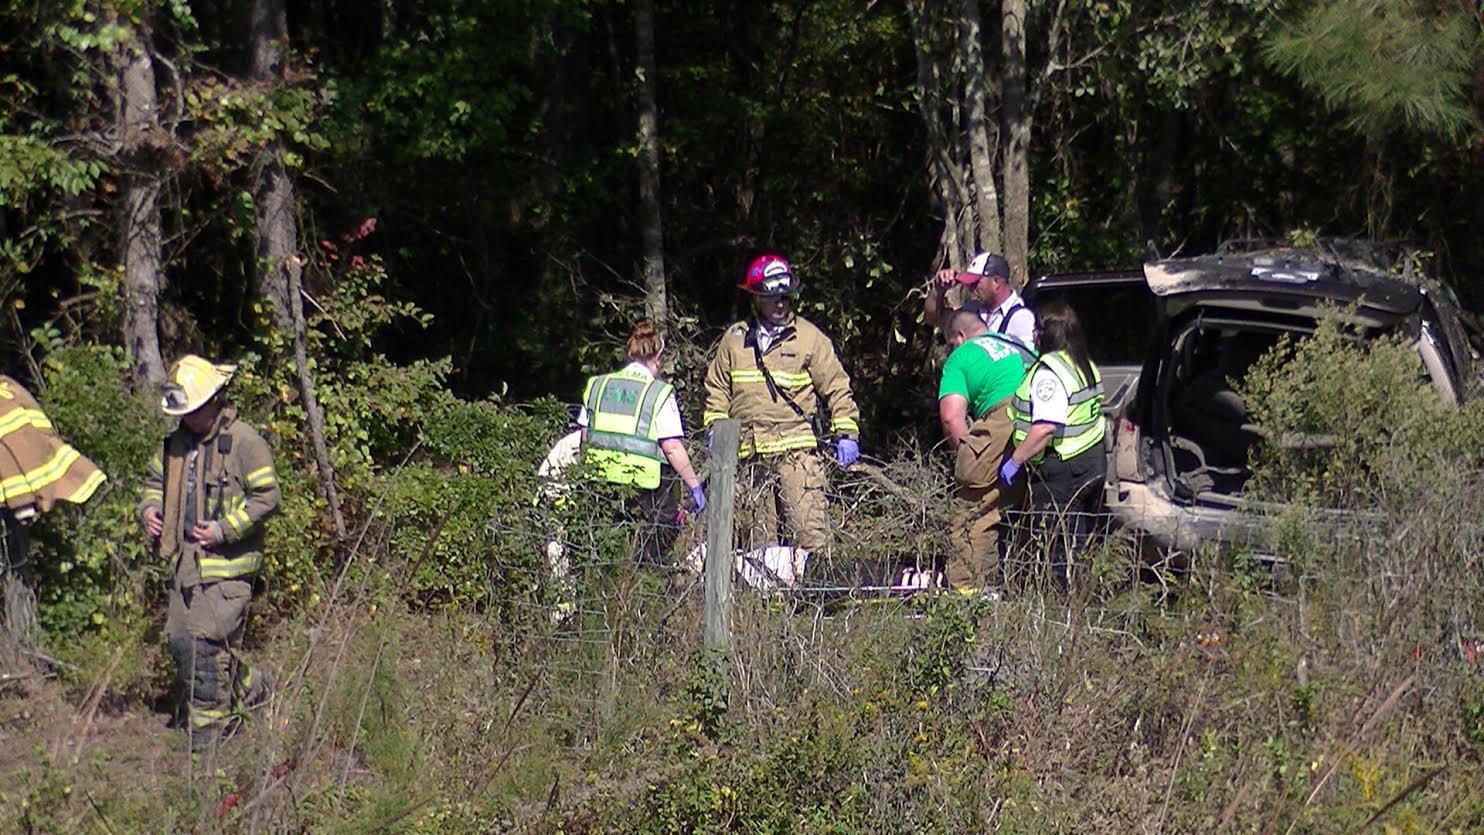 Accident US 70 10-14-15 2